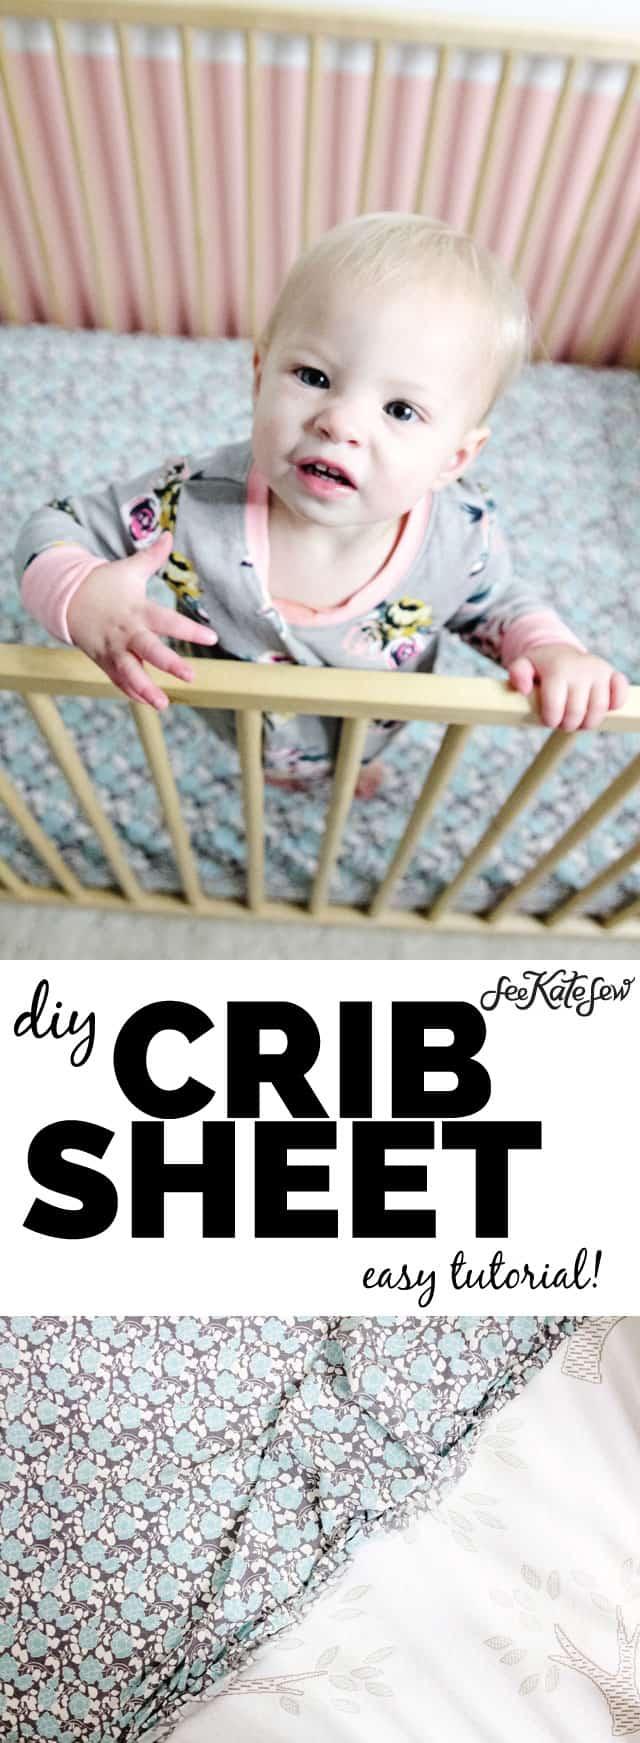 DIY easy crib sheet tutorial